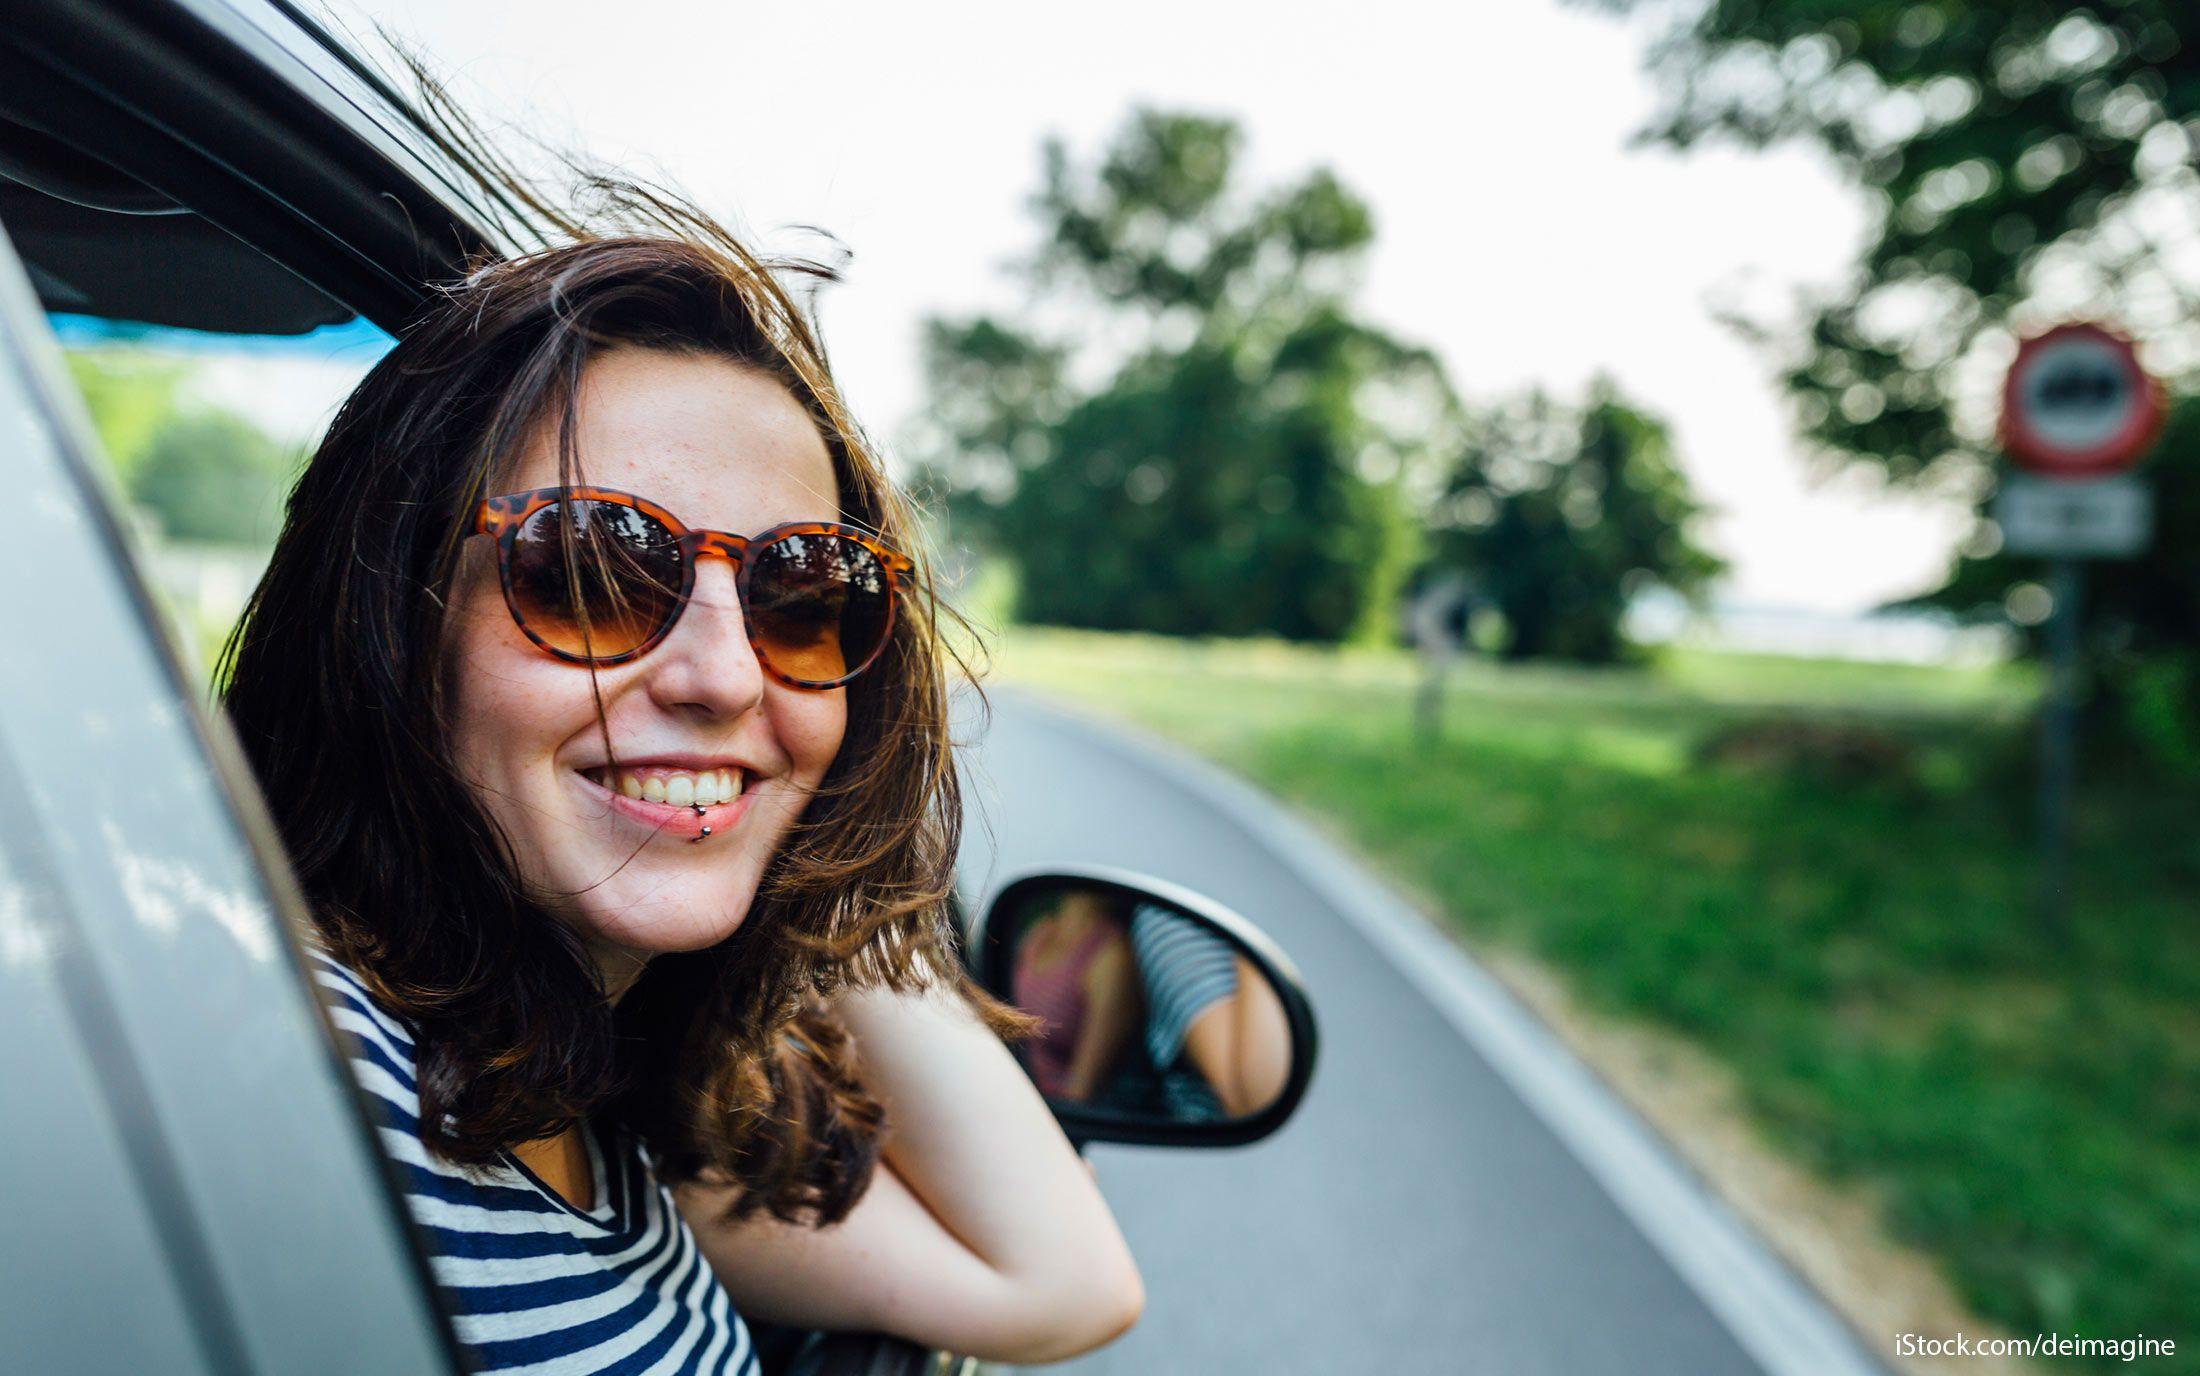 save on rental insurance